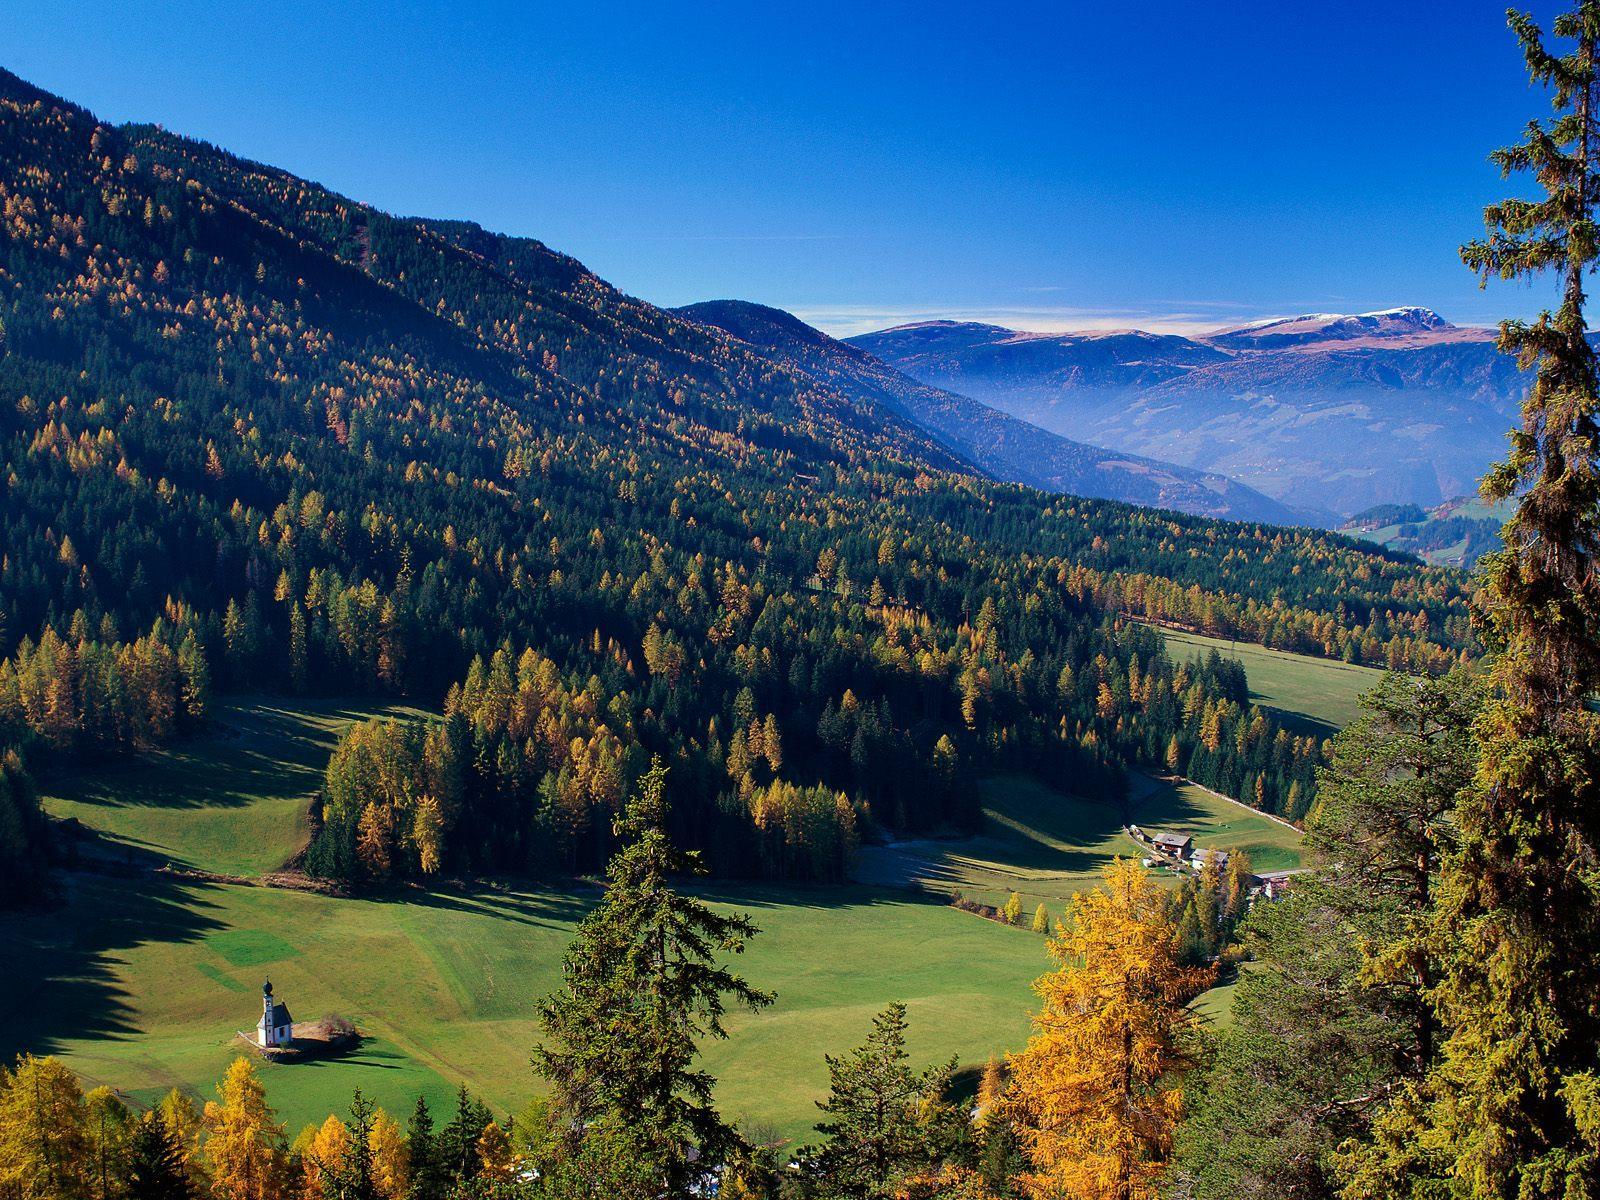 Valley wallpaper free wallpaper in free desktop backgrounds category: Valley-landscape.